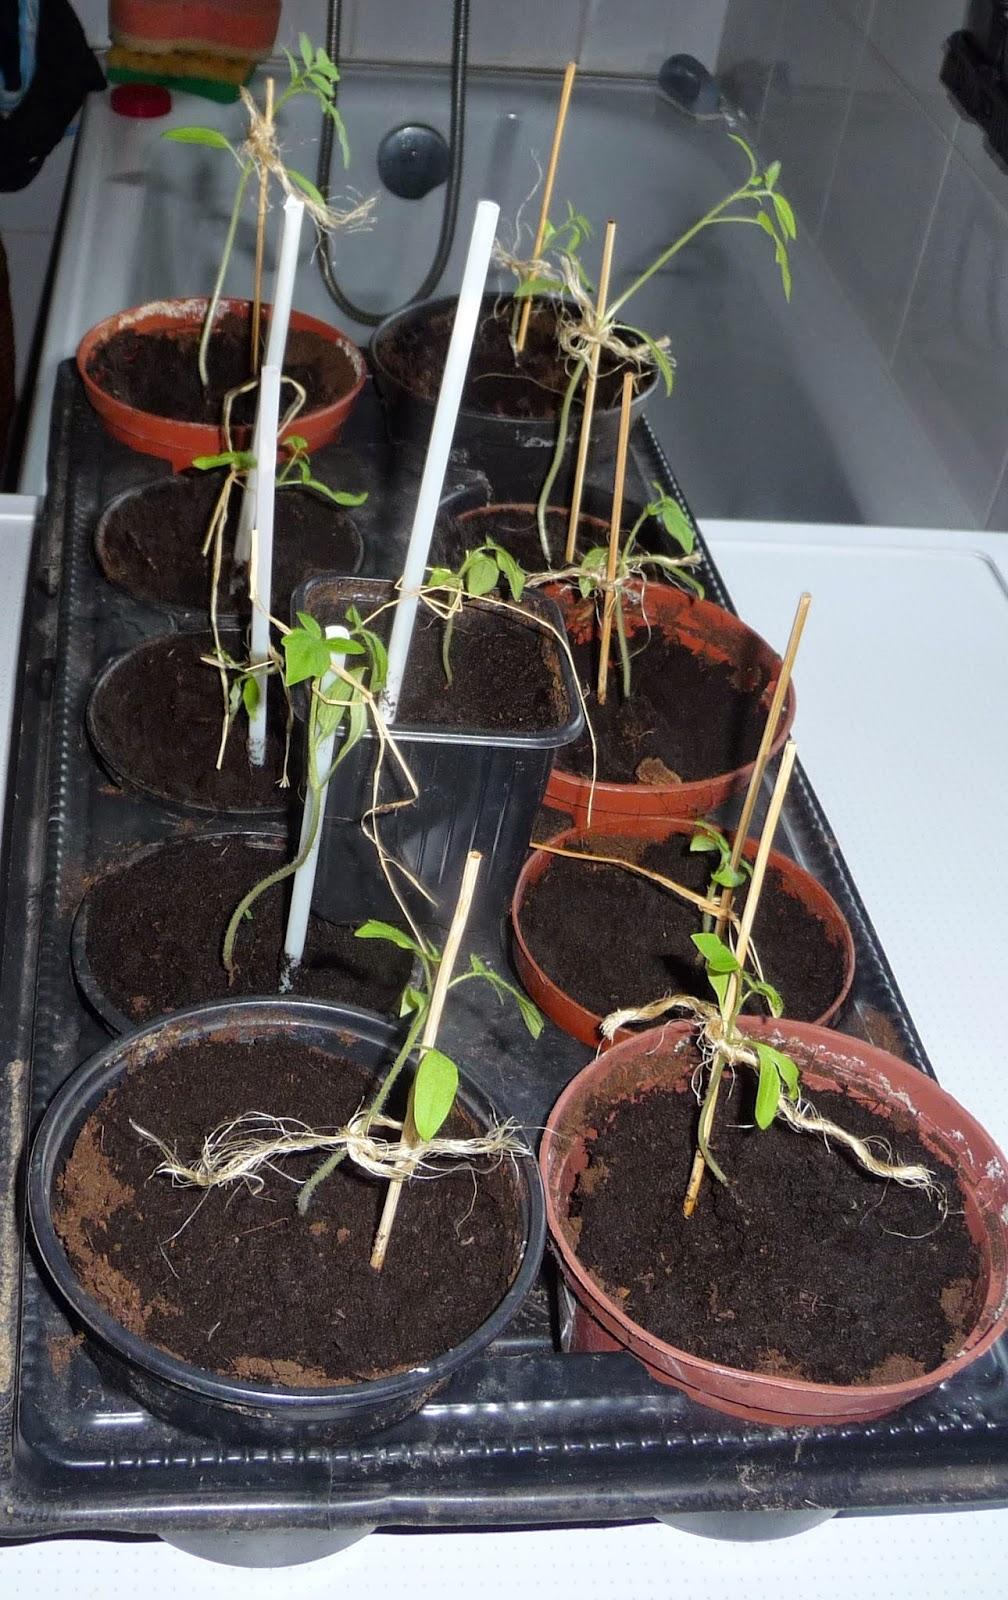 jak pikować pomidory